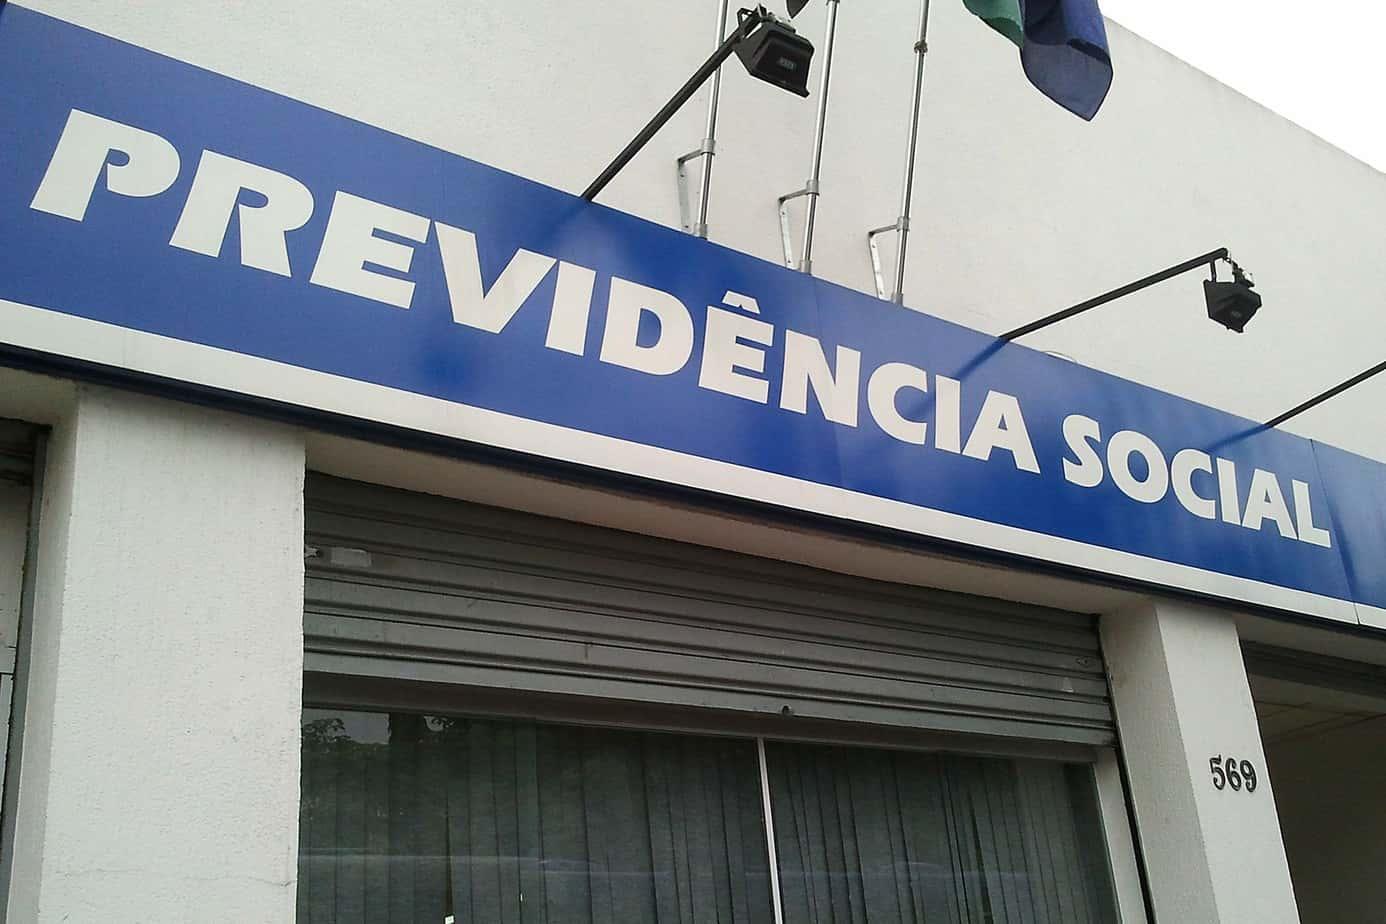 frente-previdencia-social-cnis